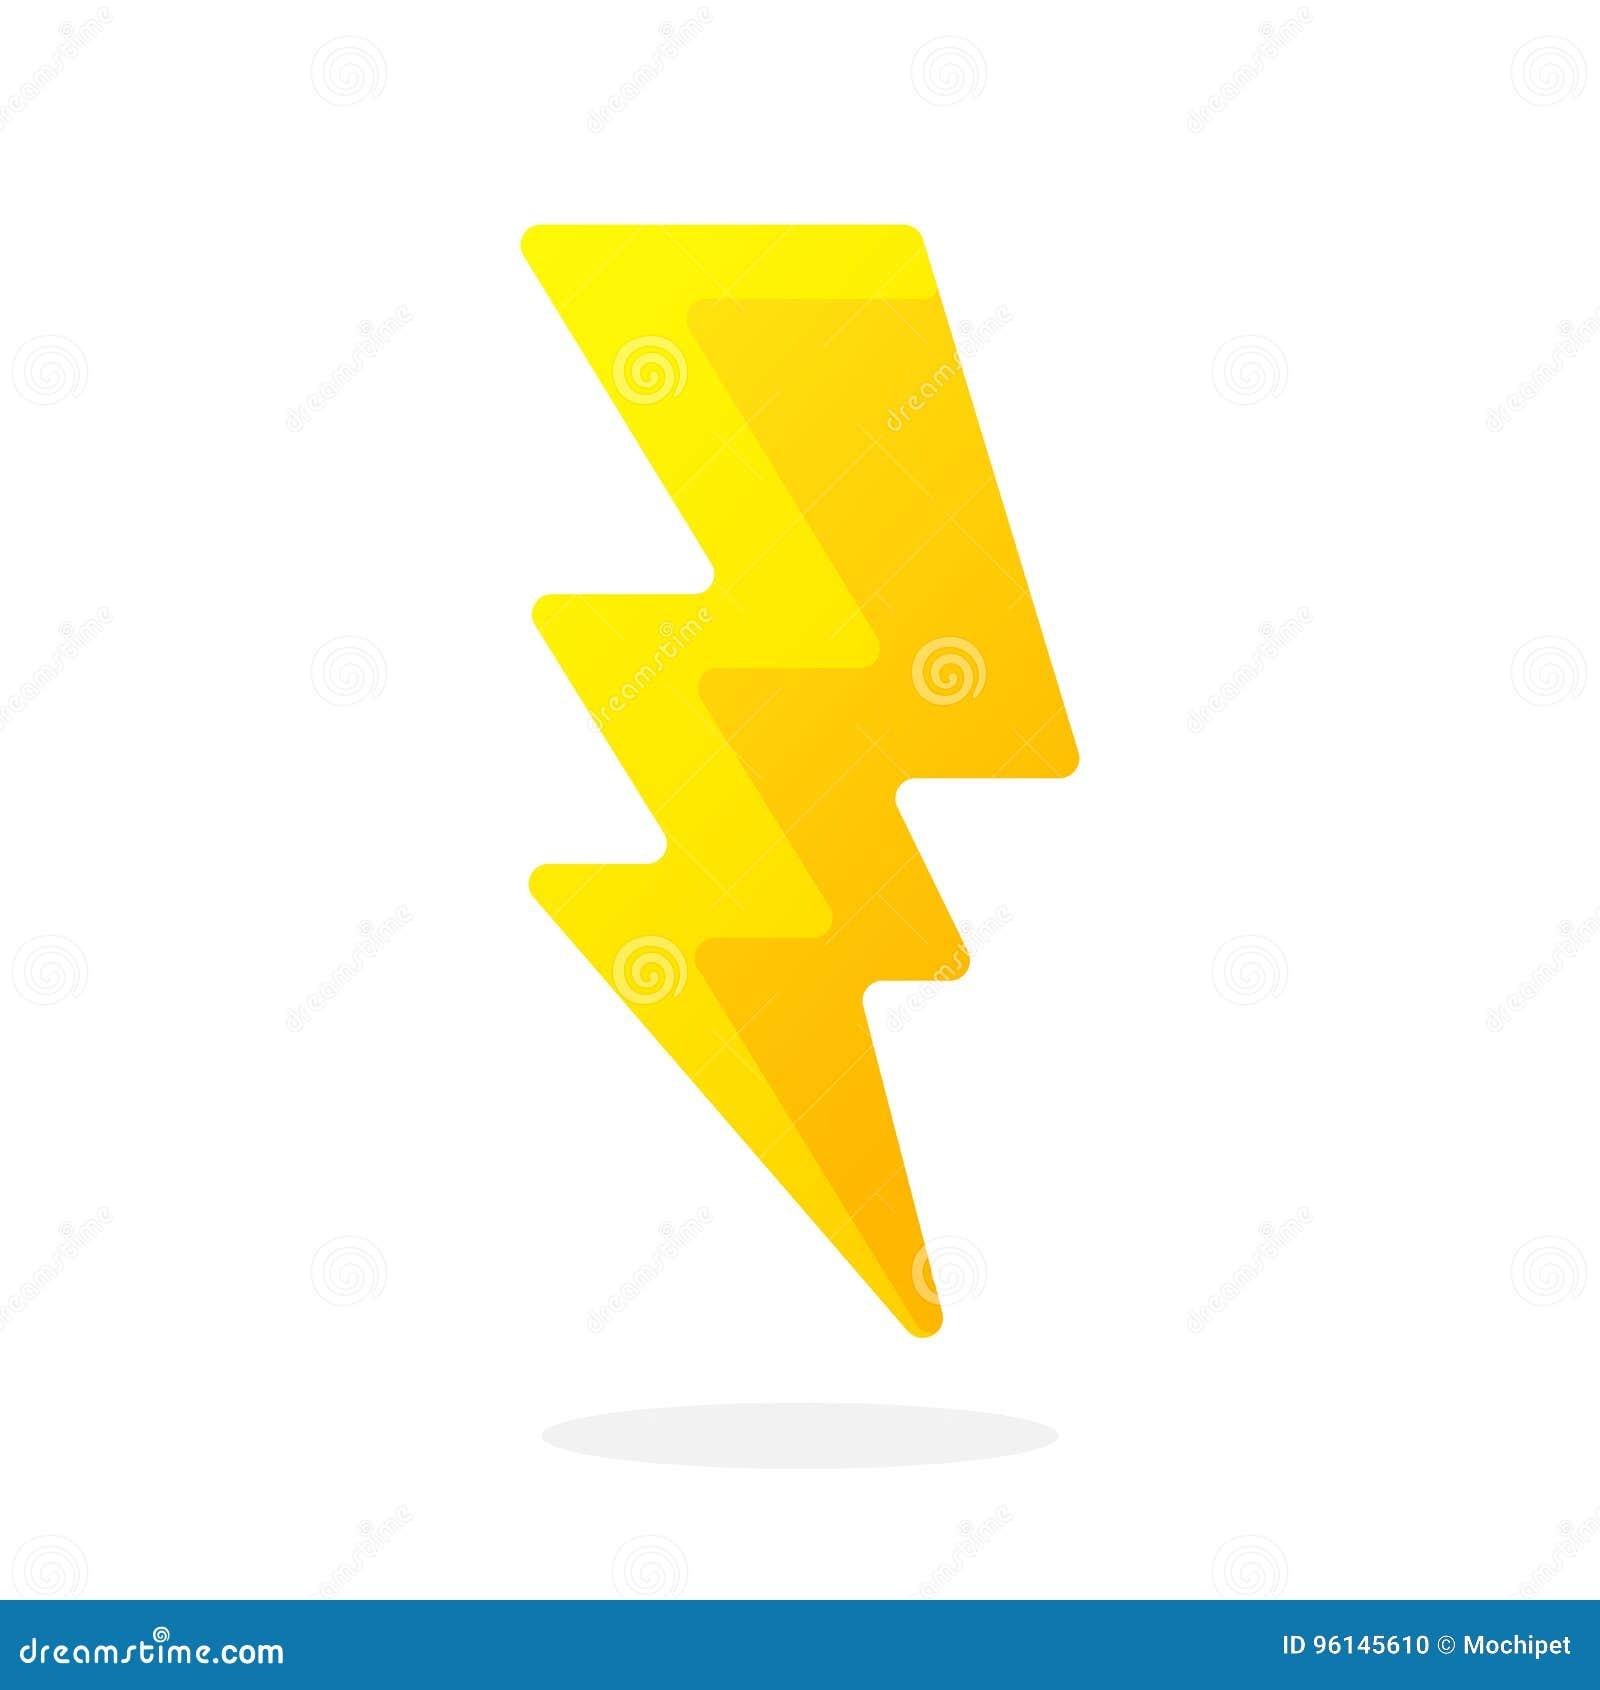 Electric lightning bolt stock vector. Illustration of electric ...